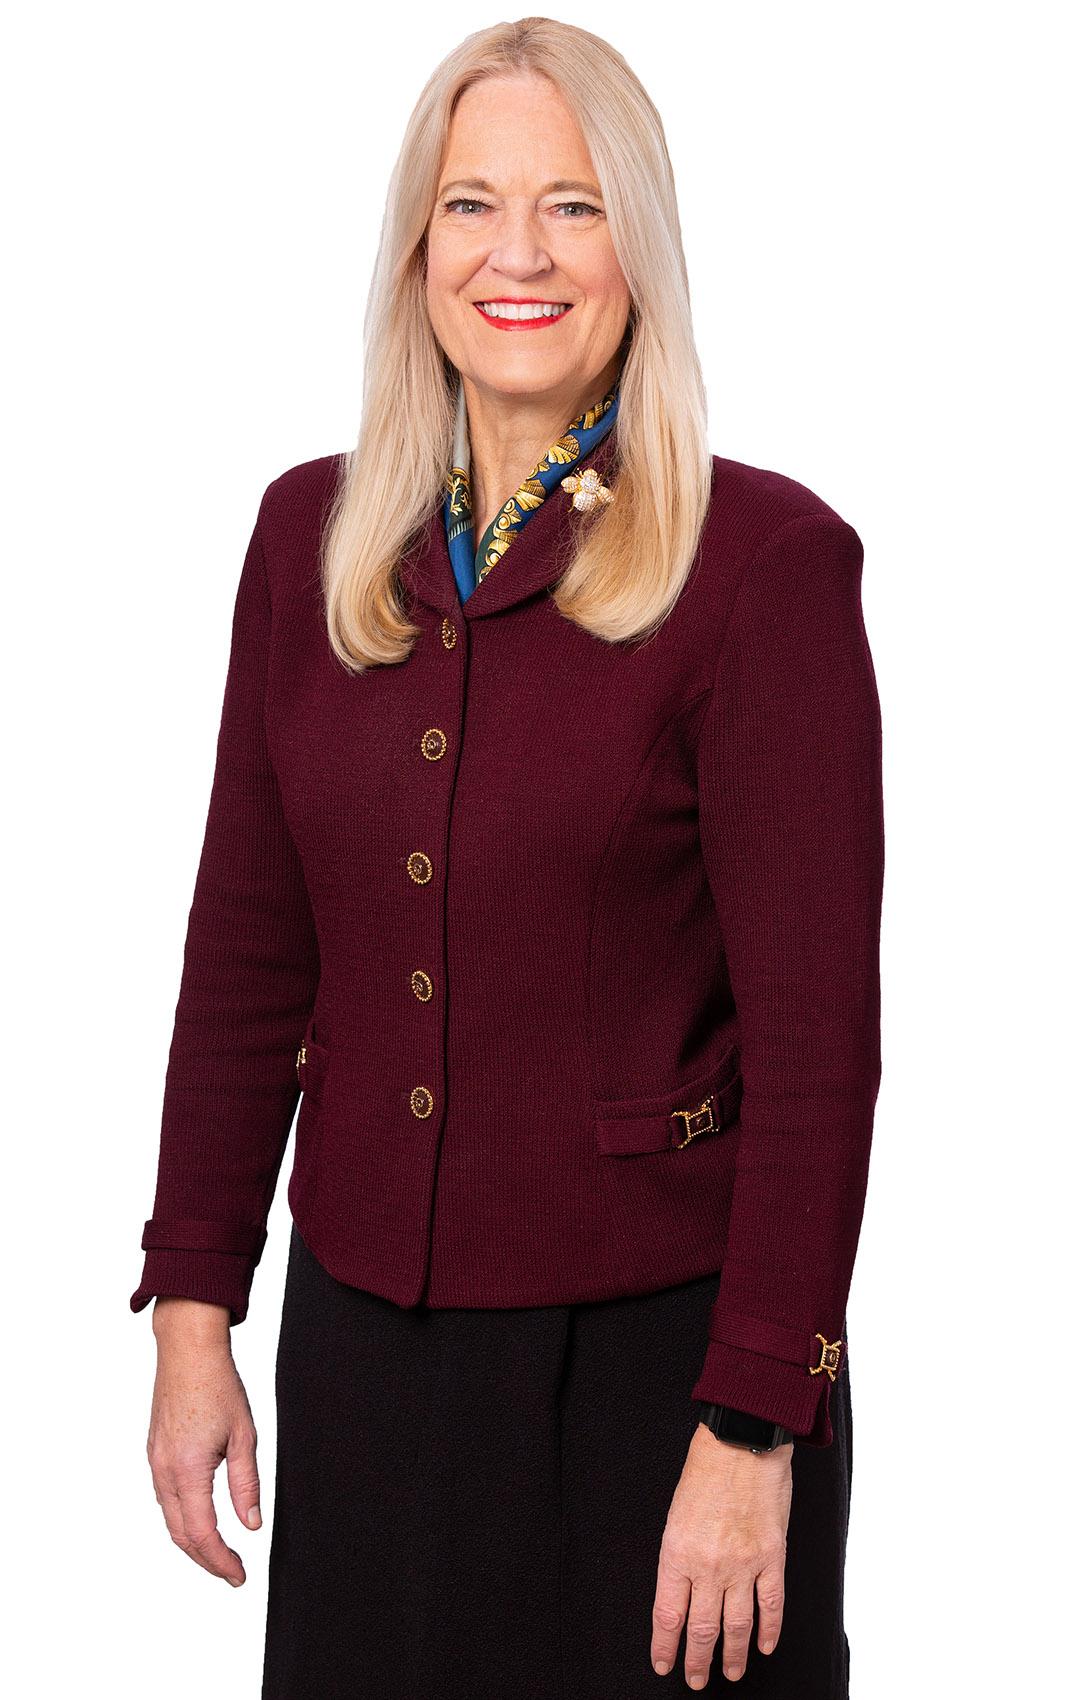 Adele Hogan